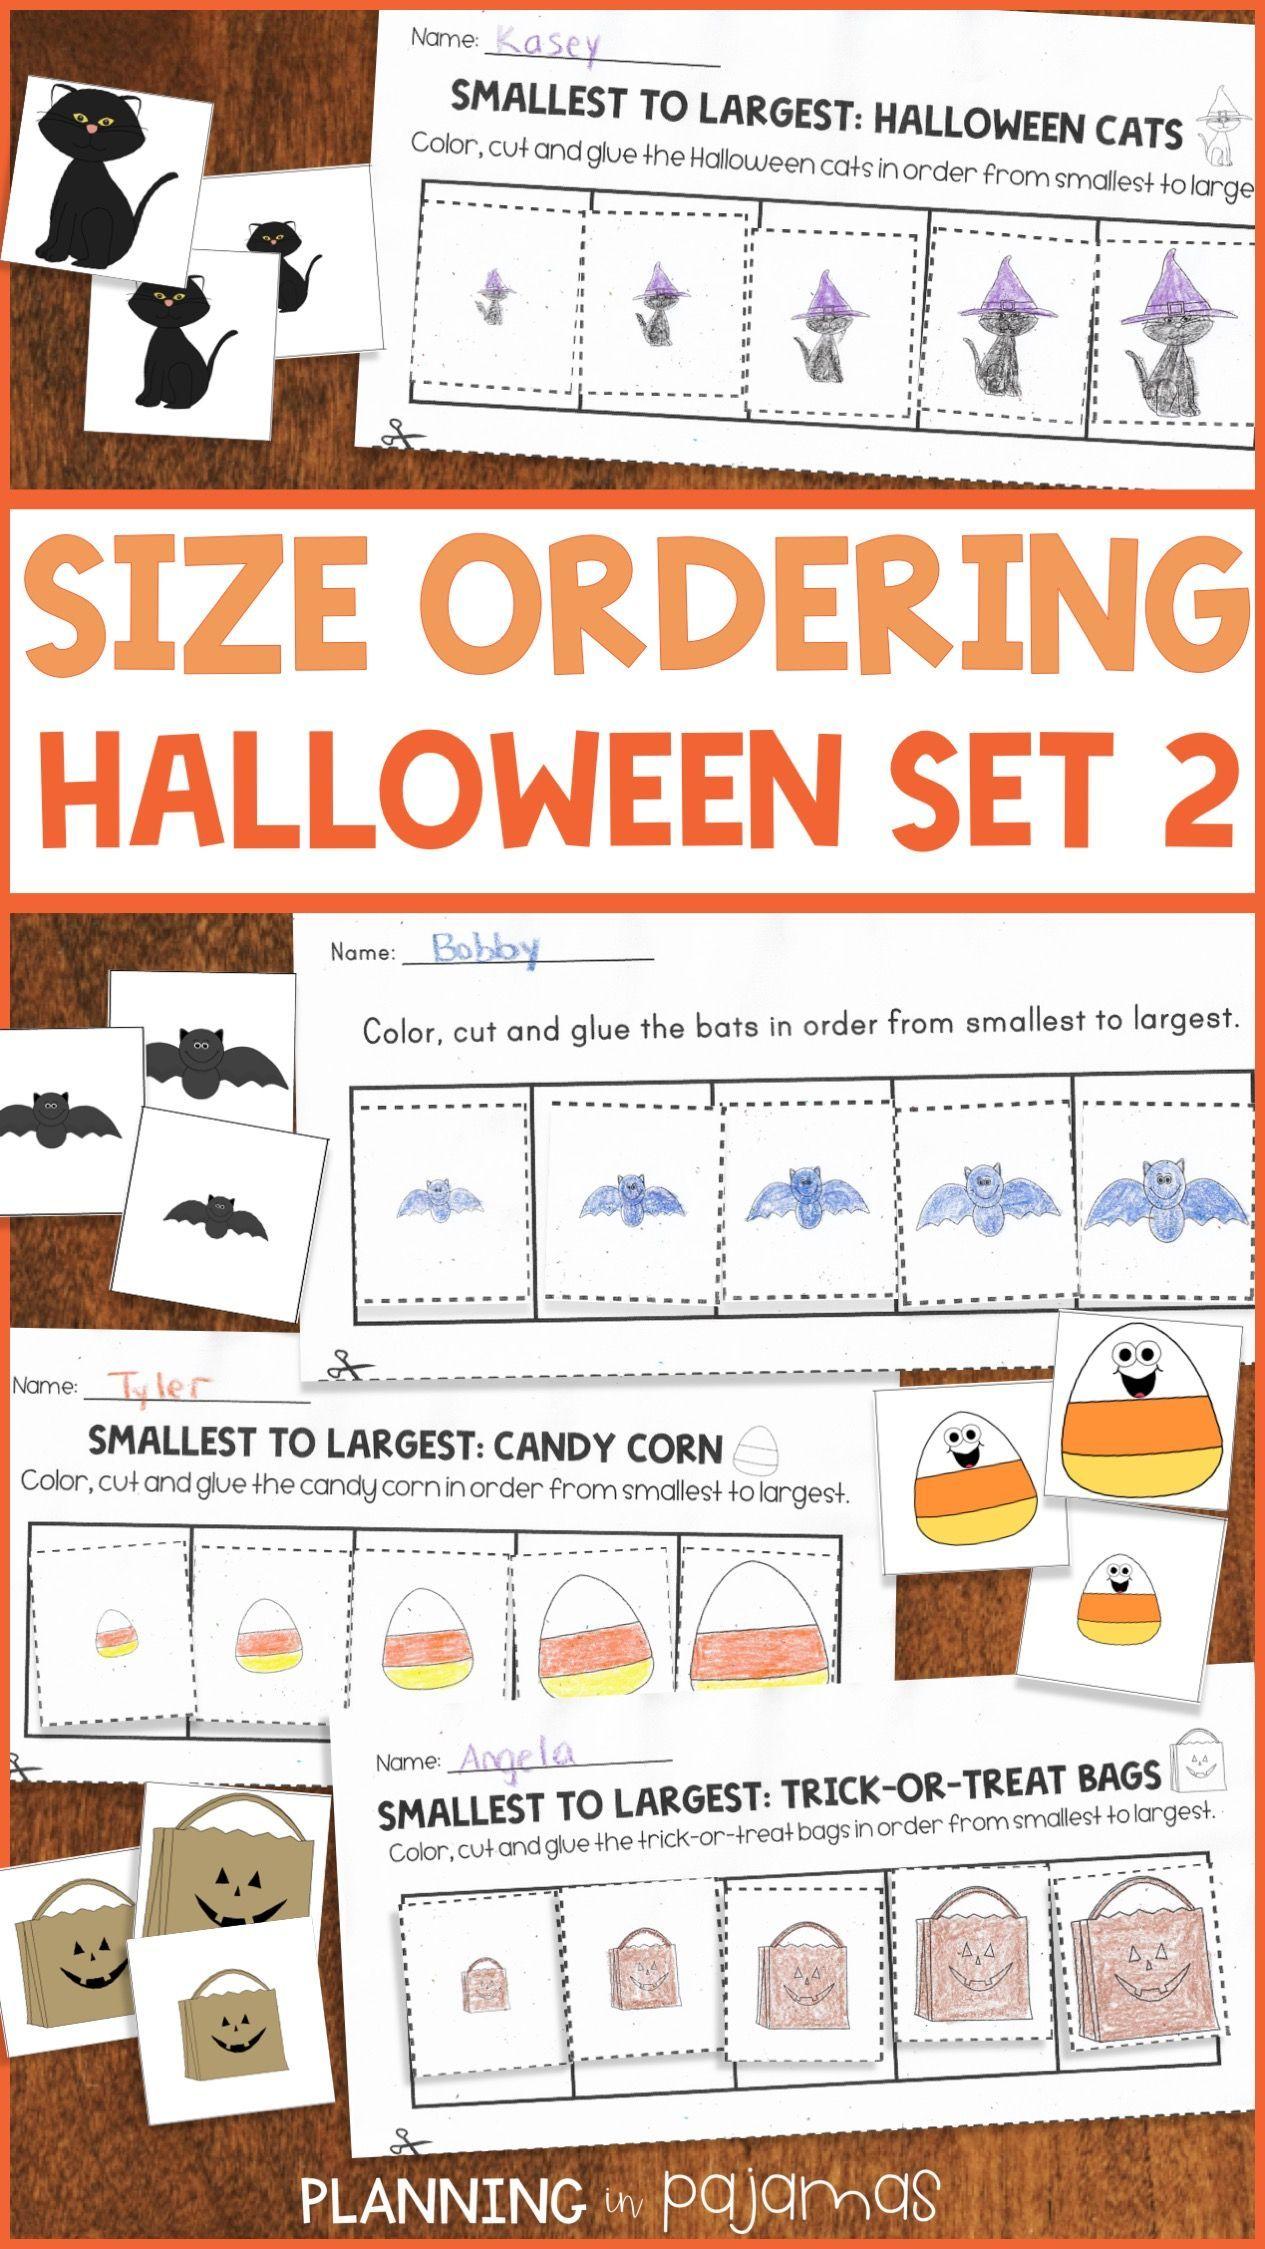 Halloween Size Ordering Set 2